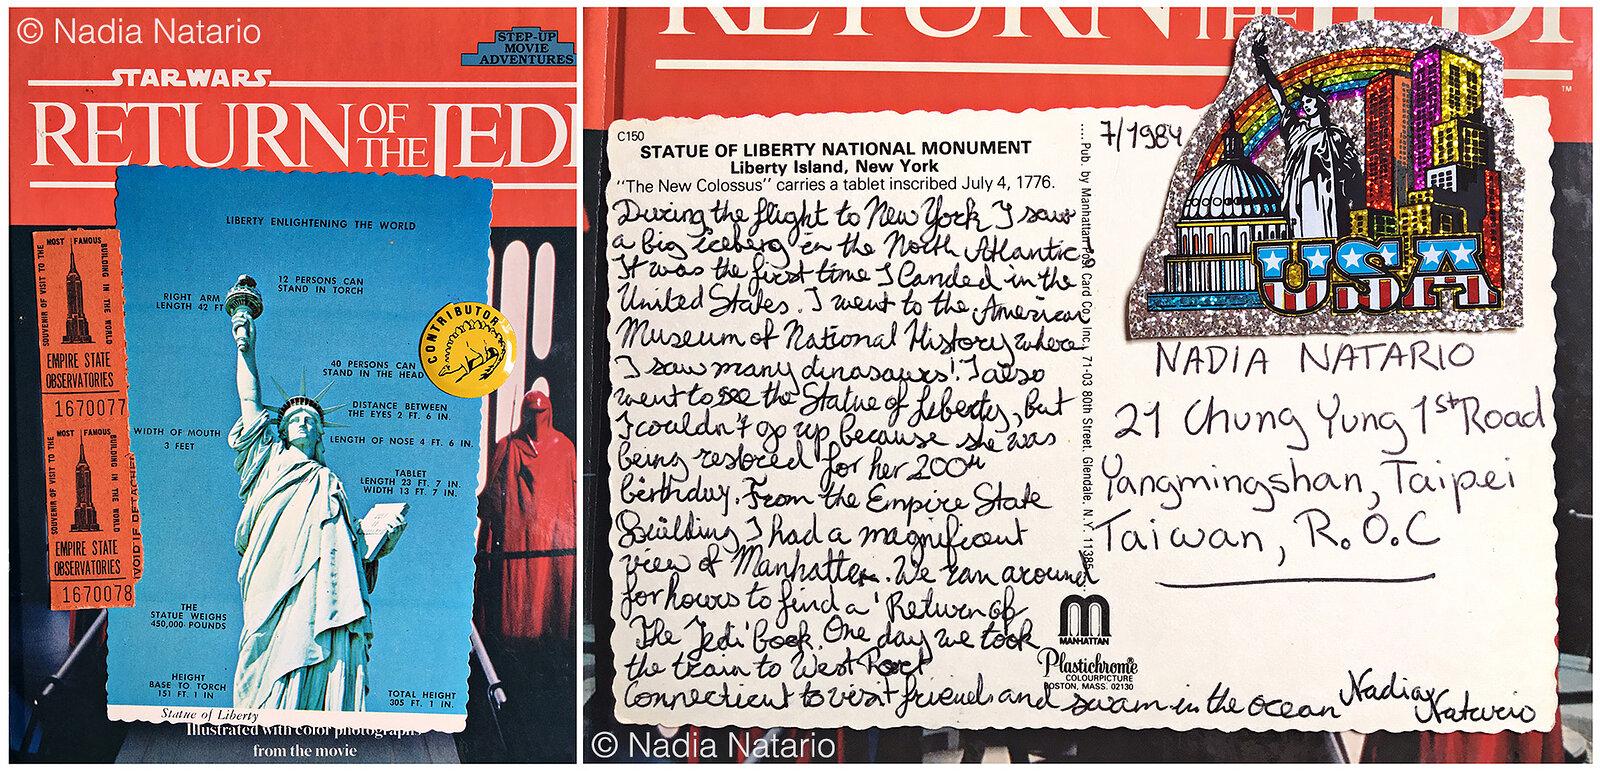 Postcards to Myself - New York, U.S.A, 1984